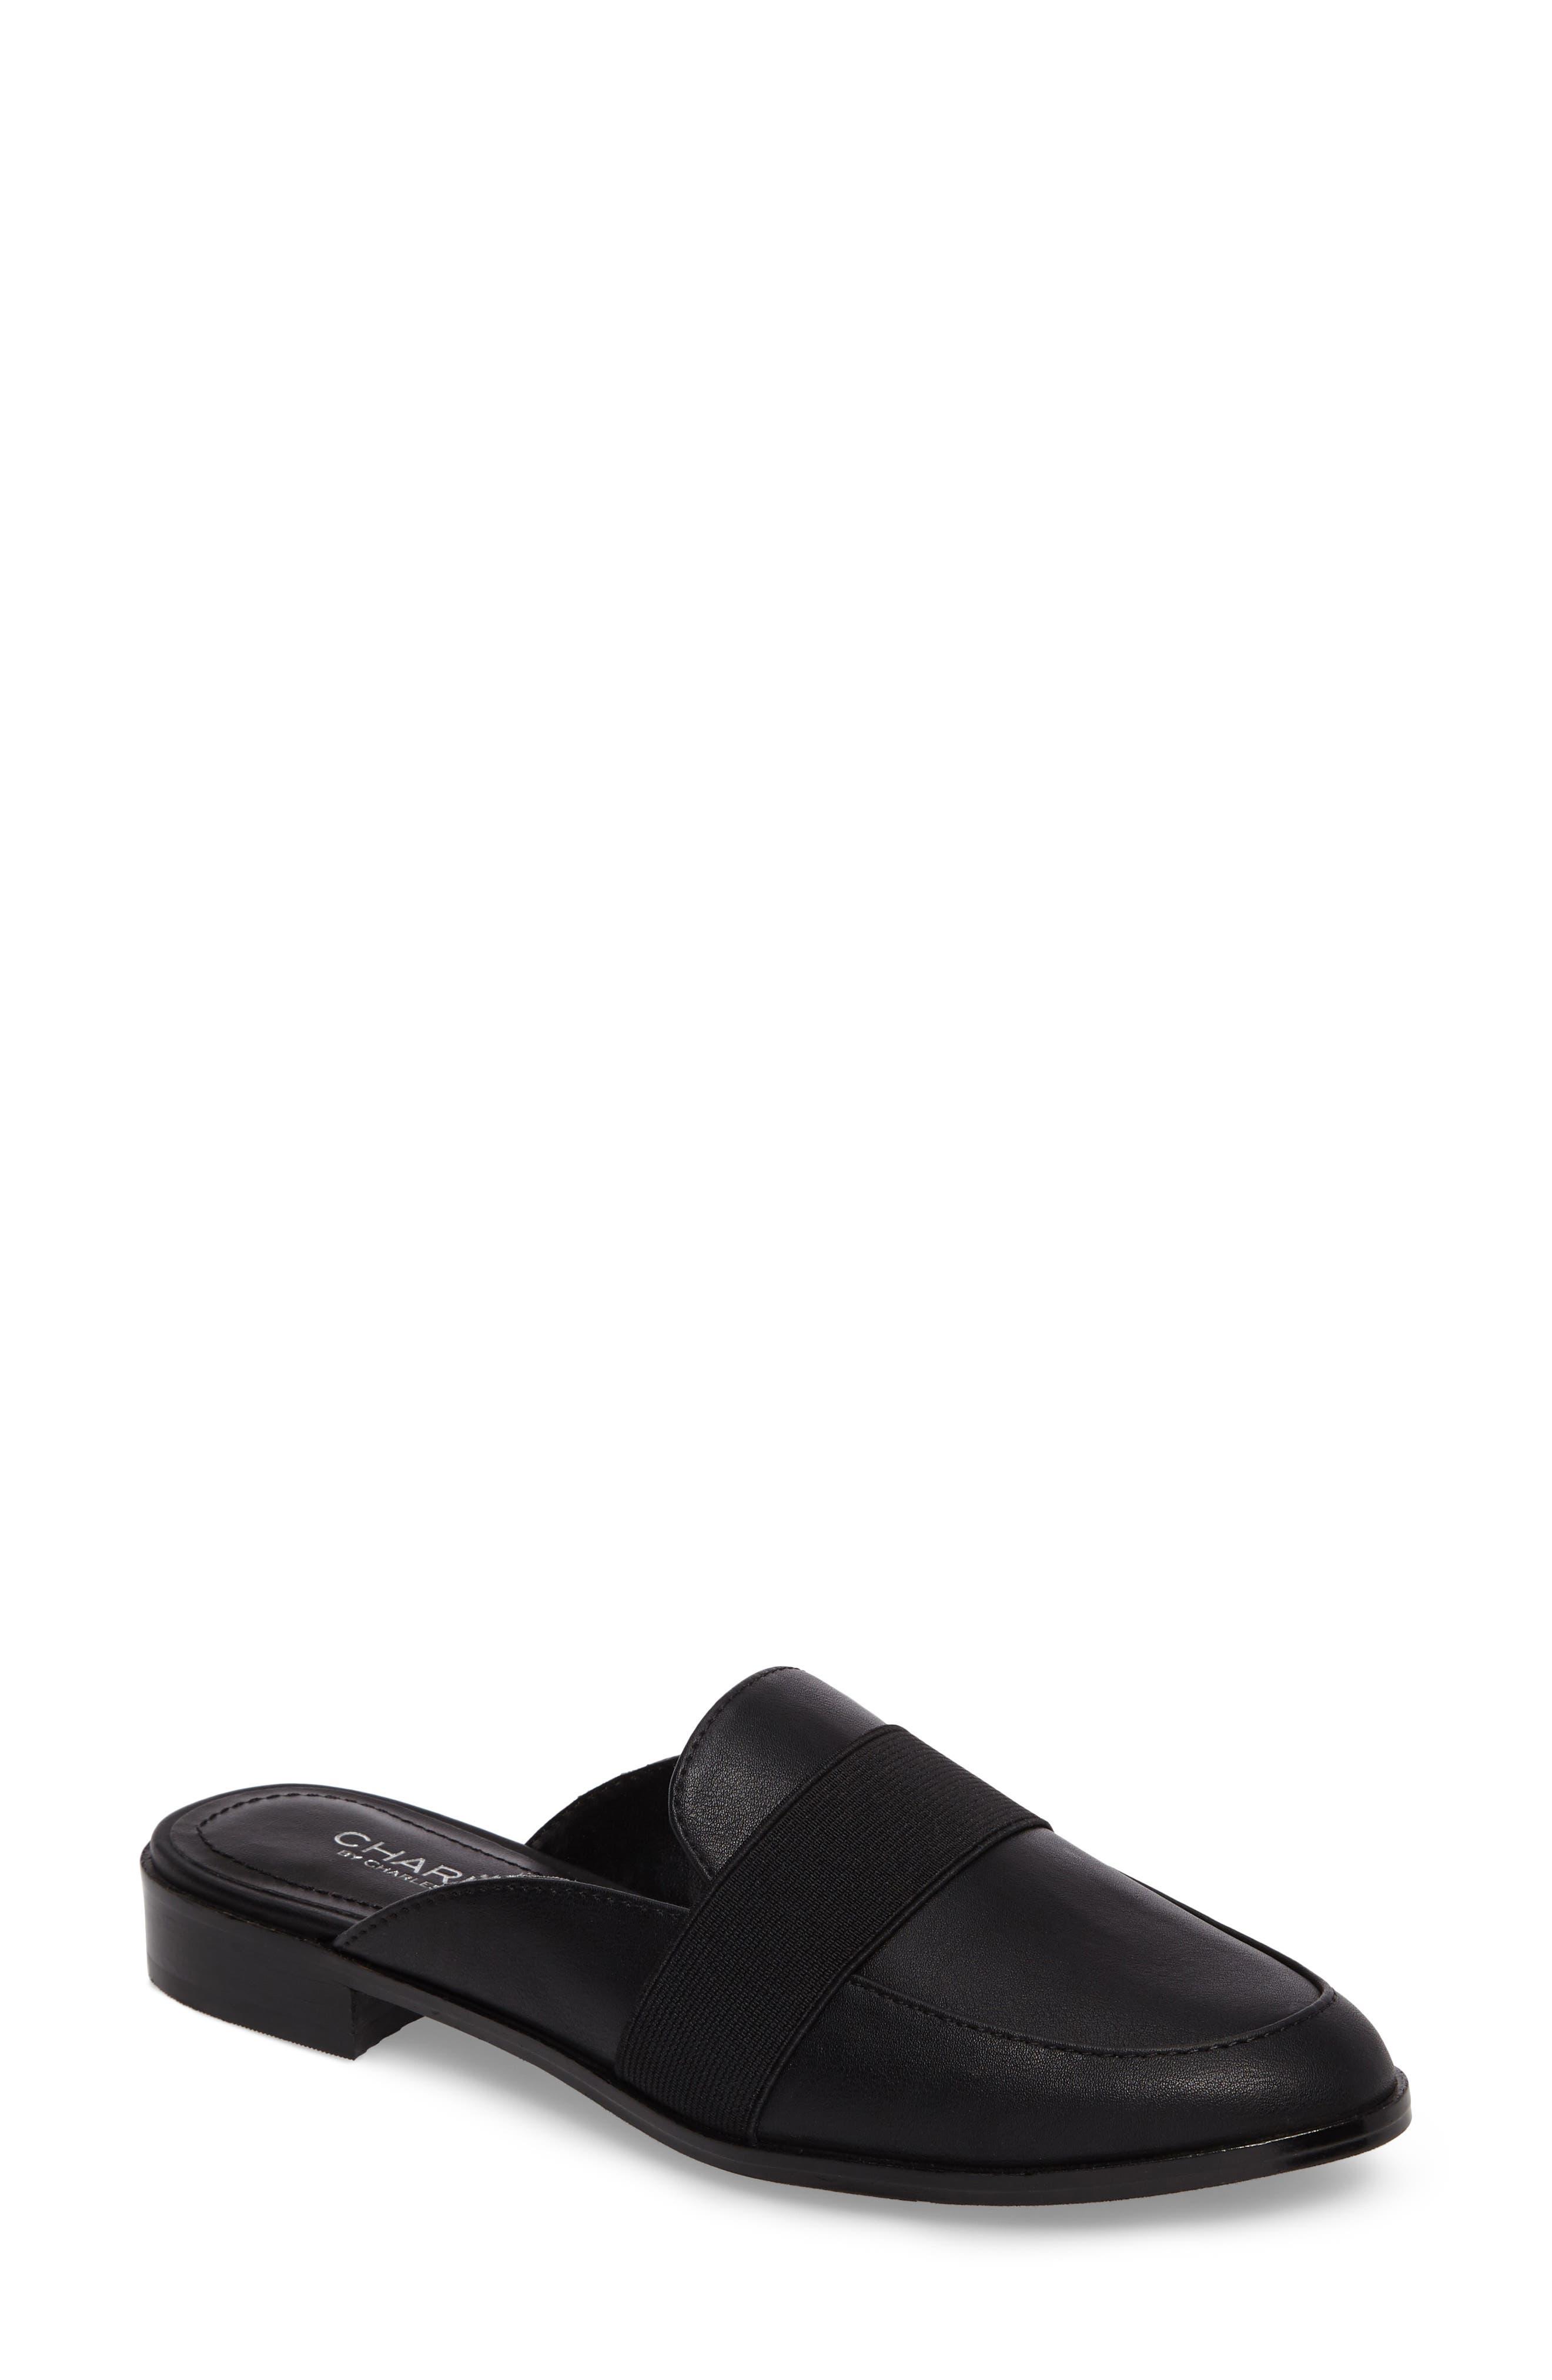 Georgi Loafer Mule,                         Main,                         color, Black Smooth